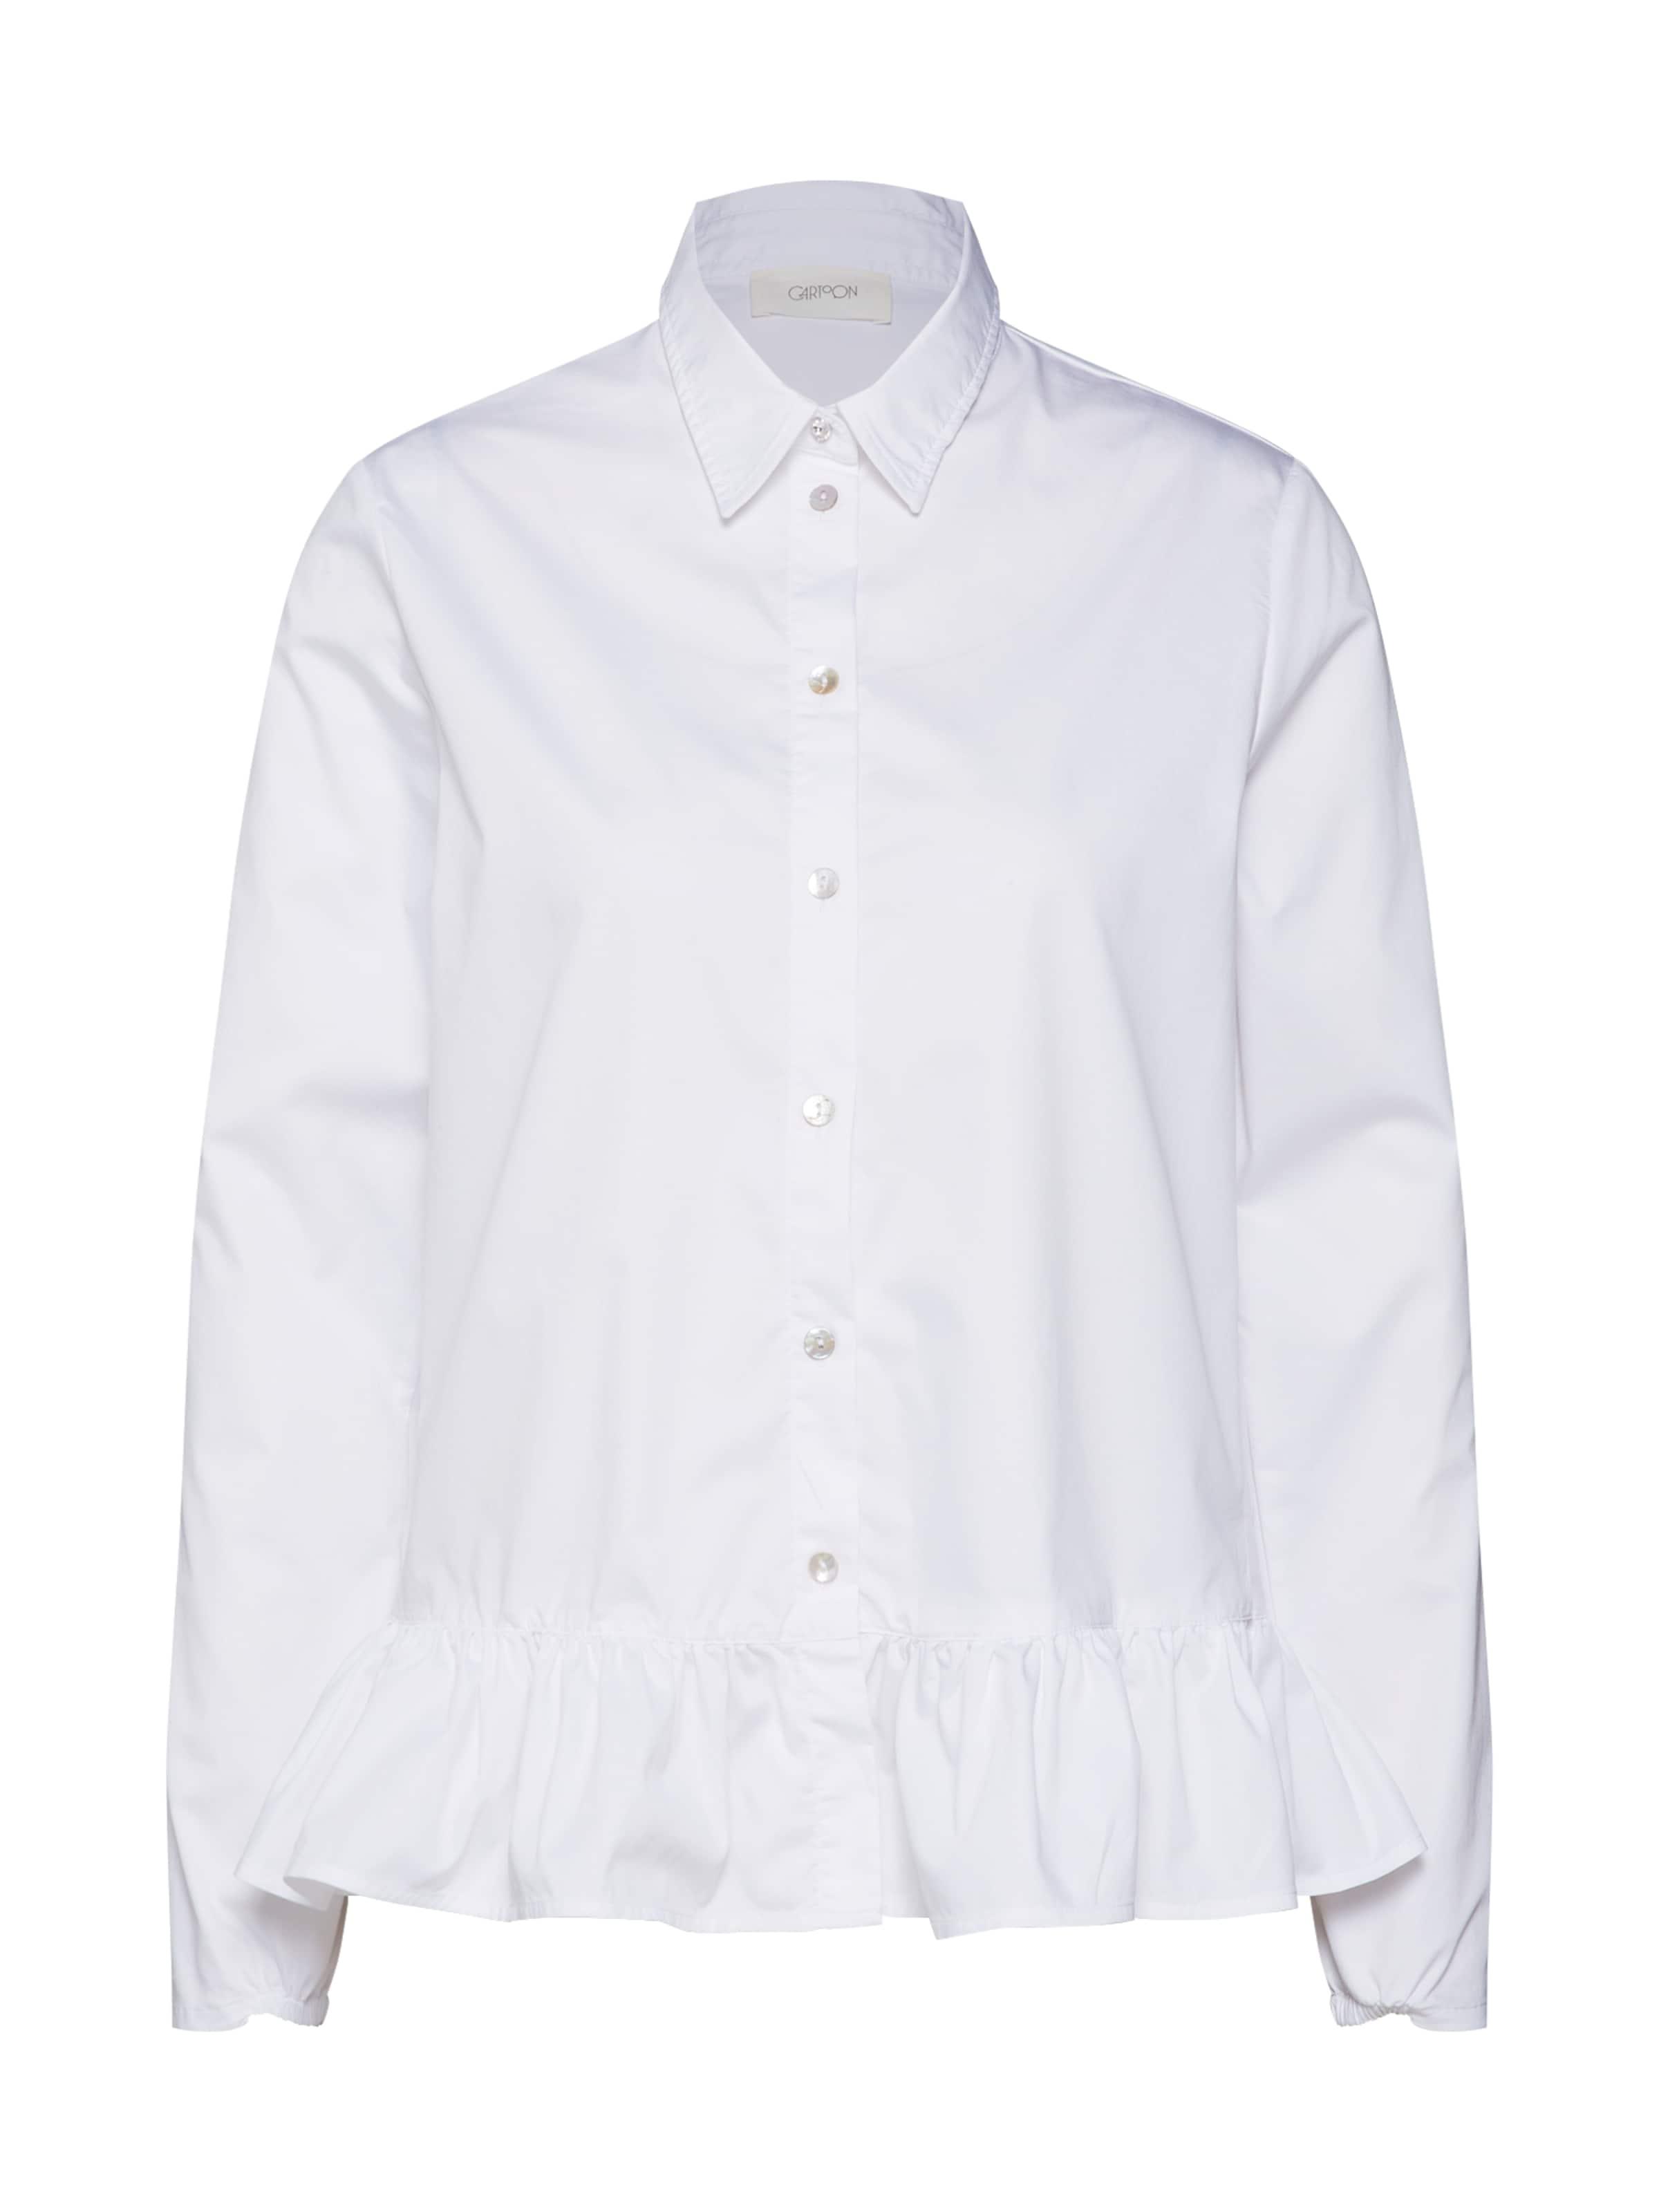 Chemisier 'bluse' Cartoon Blanc 'bluse' En 'bluse' Cartoon Cartoon Blanc Chemisier En En Chemisier 8vmNnw0